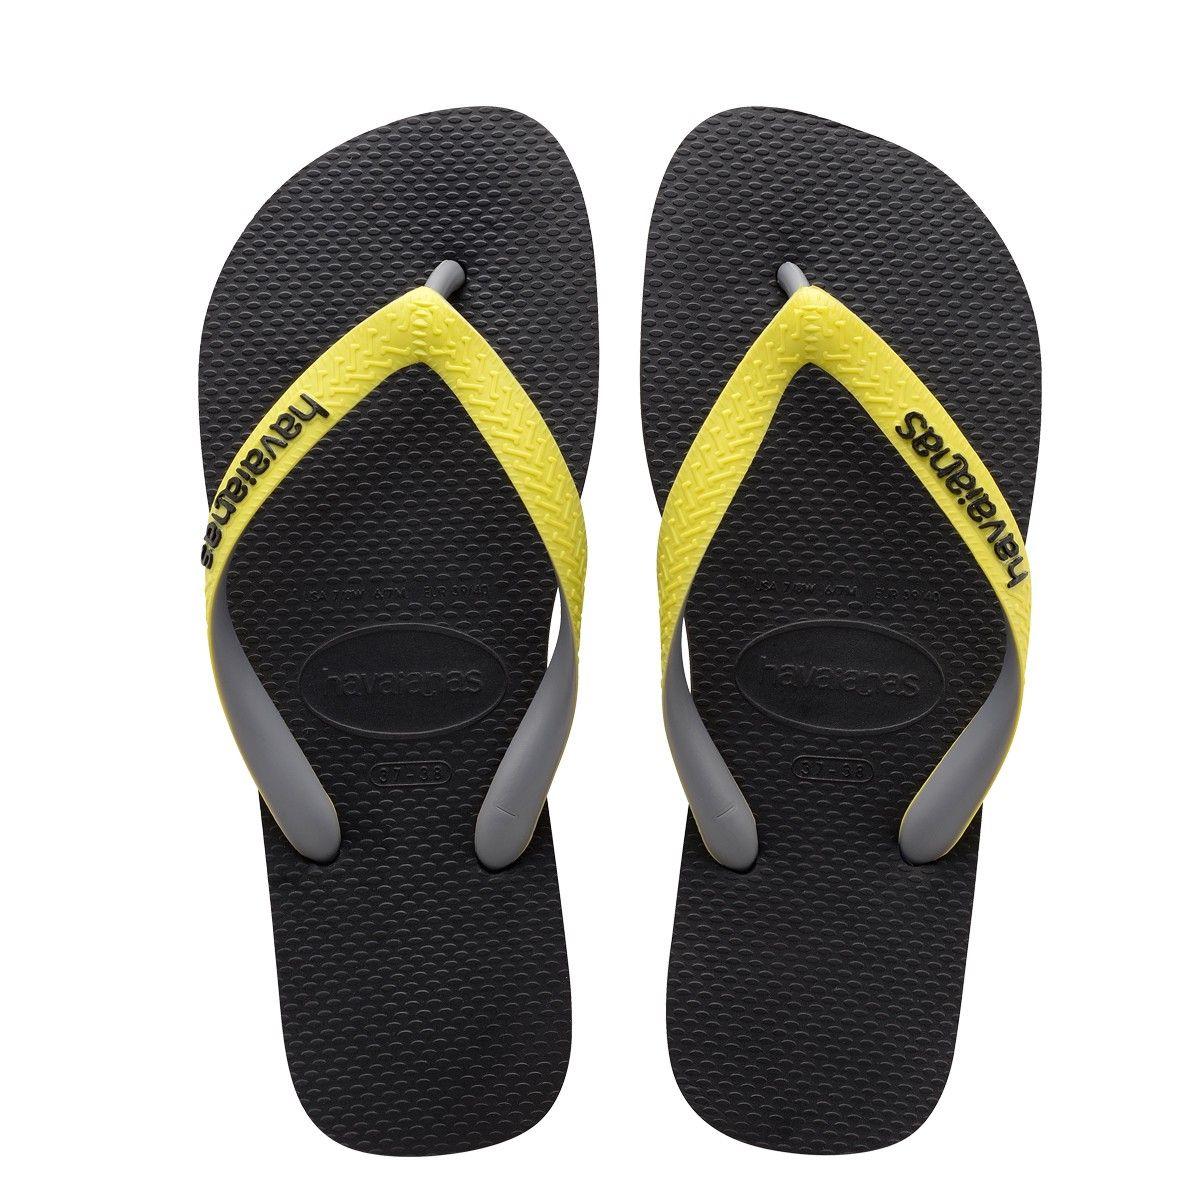 f19cb75d325fc HAVAIANAS TOP MIX SANDAL BLACK NEON YELLOW.  havaianas  shoes ...